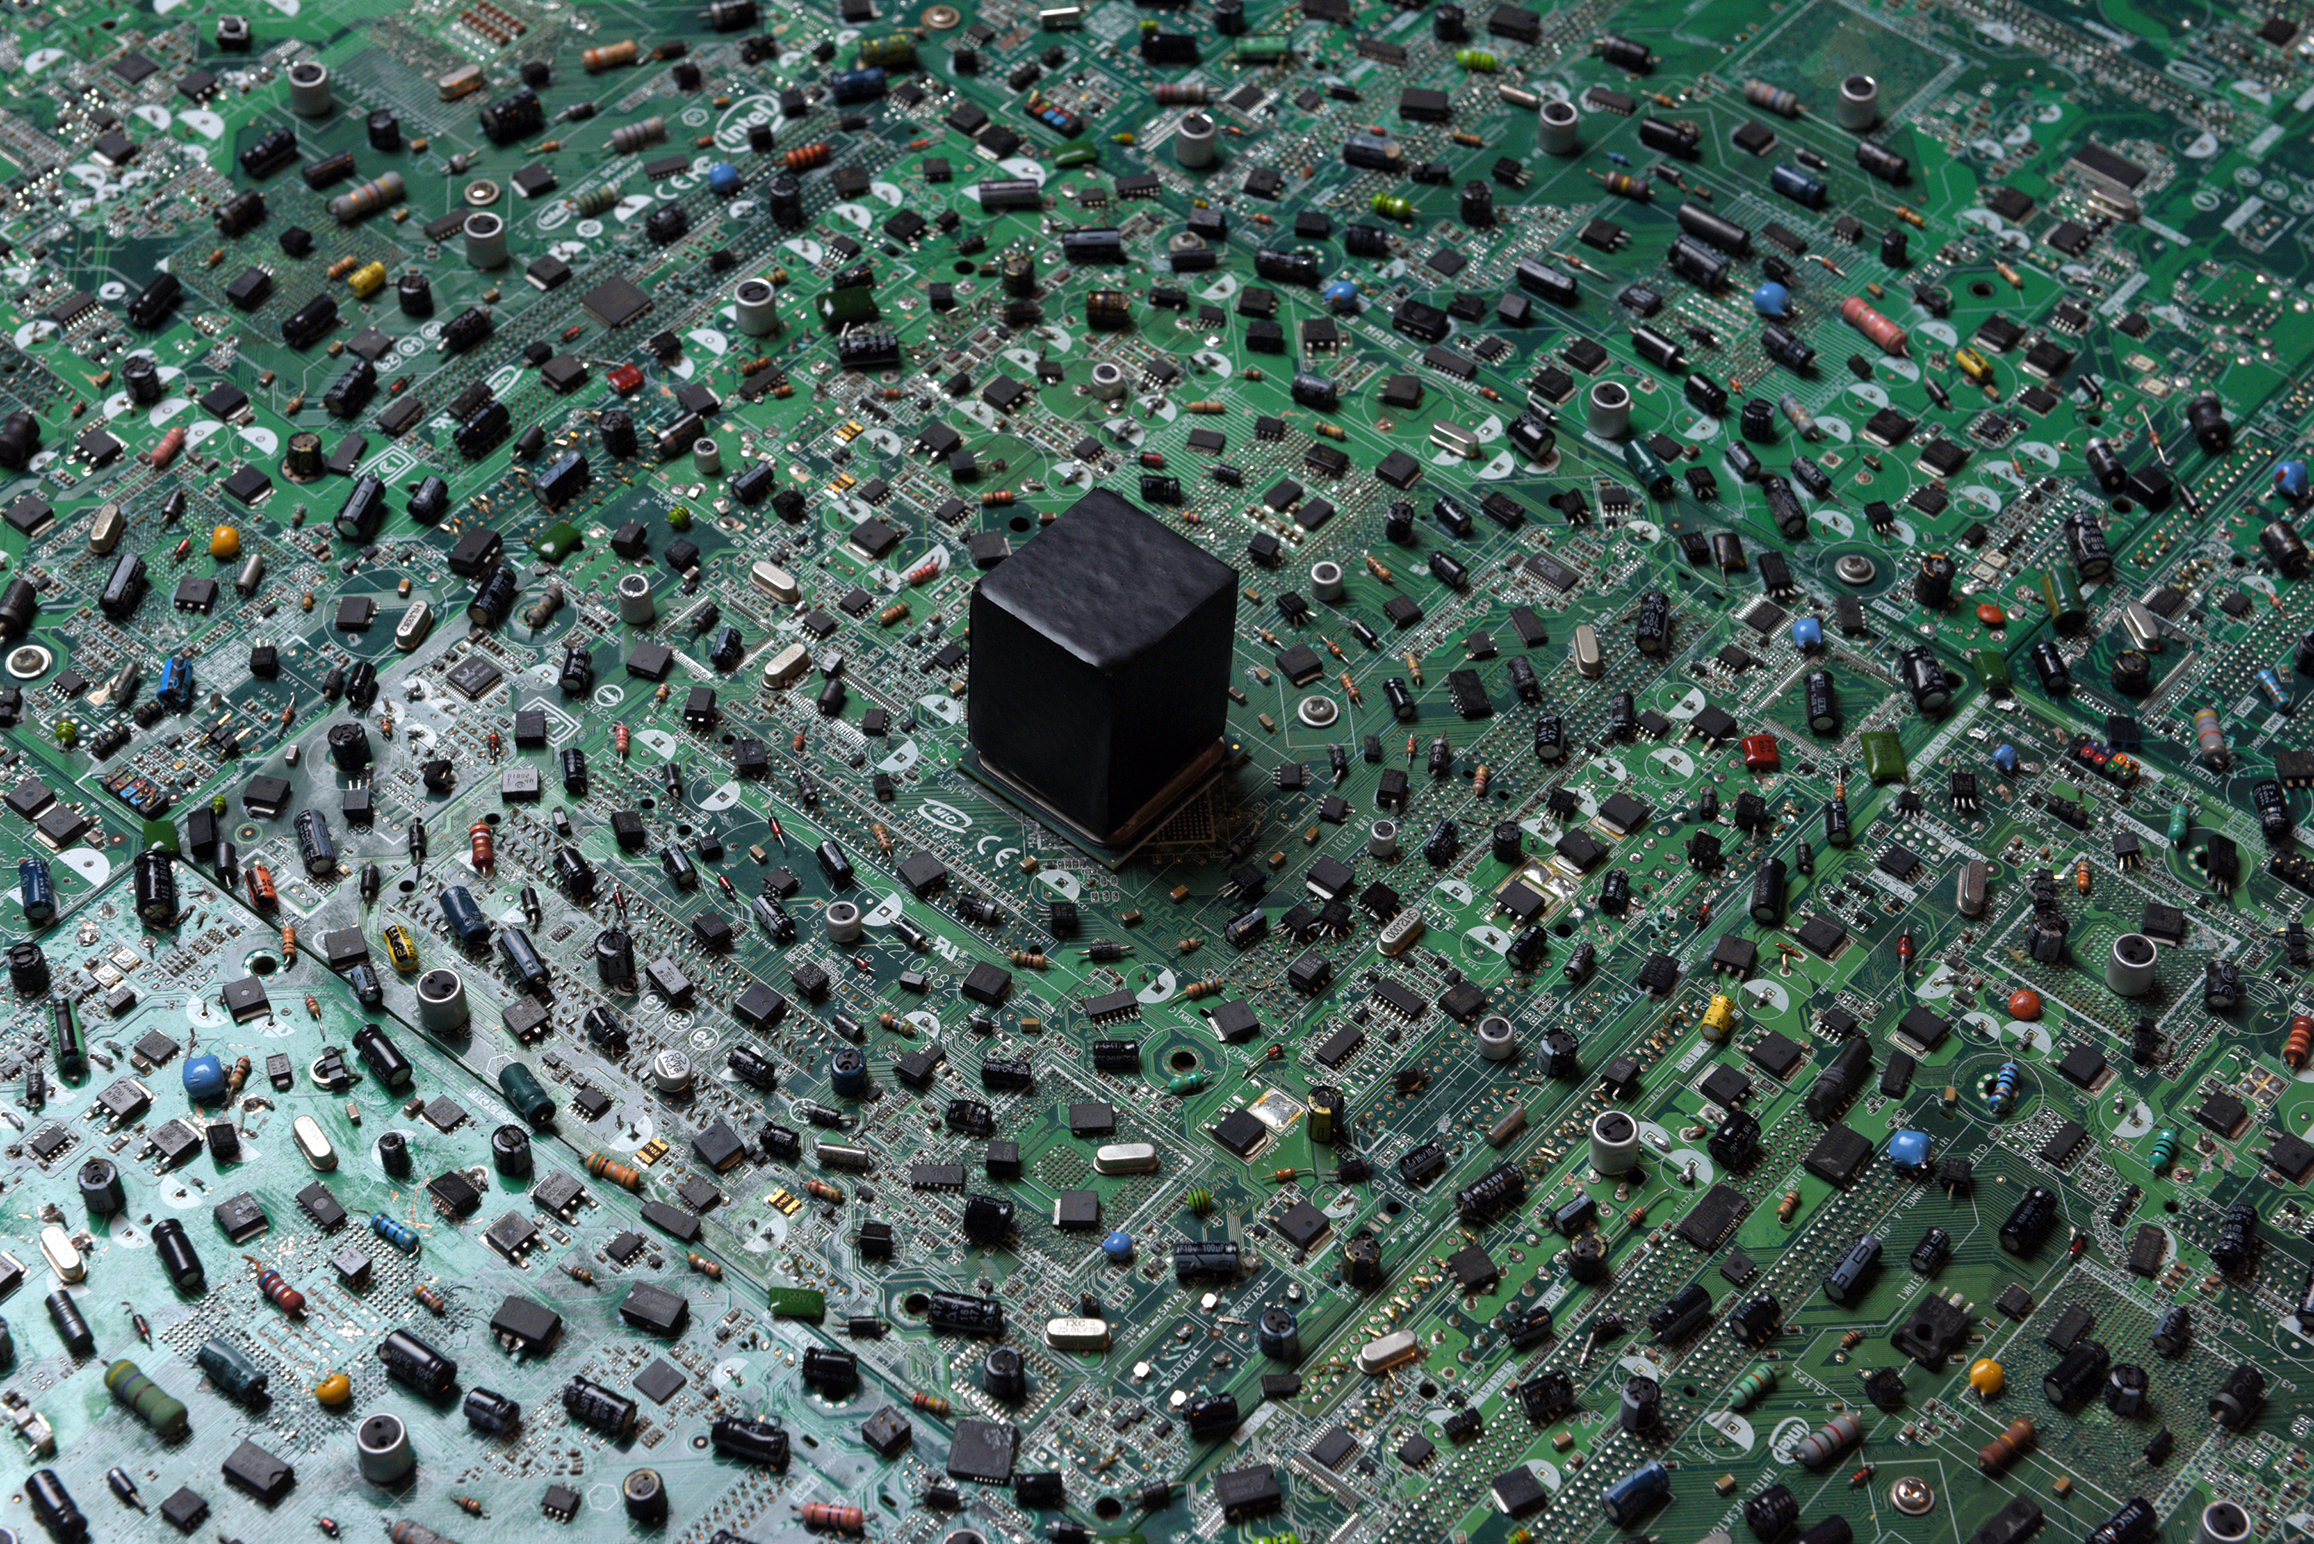 Digital Spirituality , 2016 Circuit board mixed media installation and 3D print (73.4 × 73.4 × 8 cm)